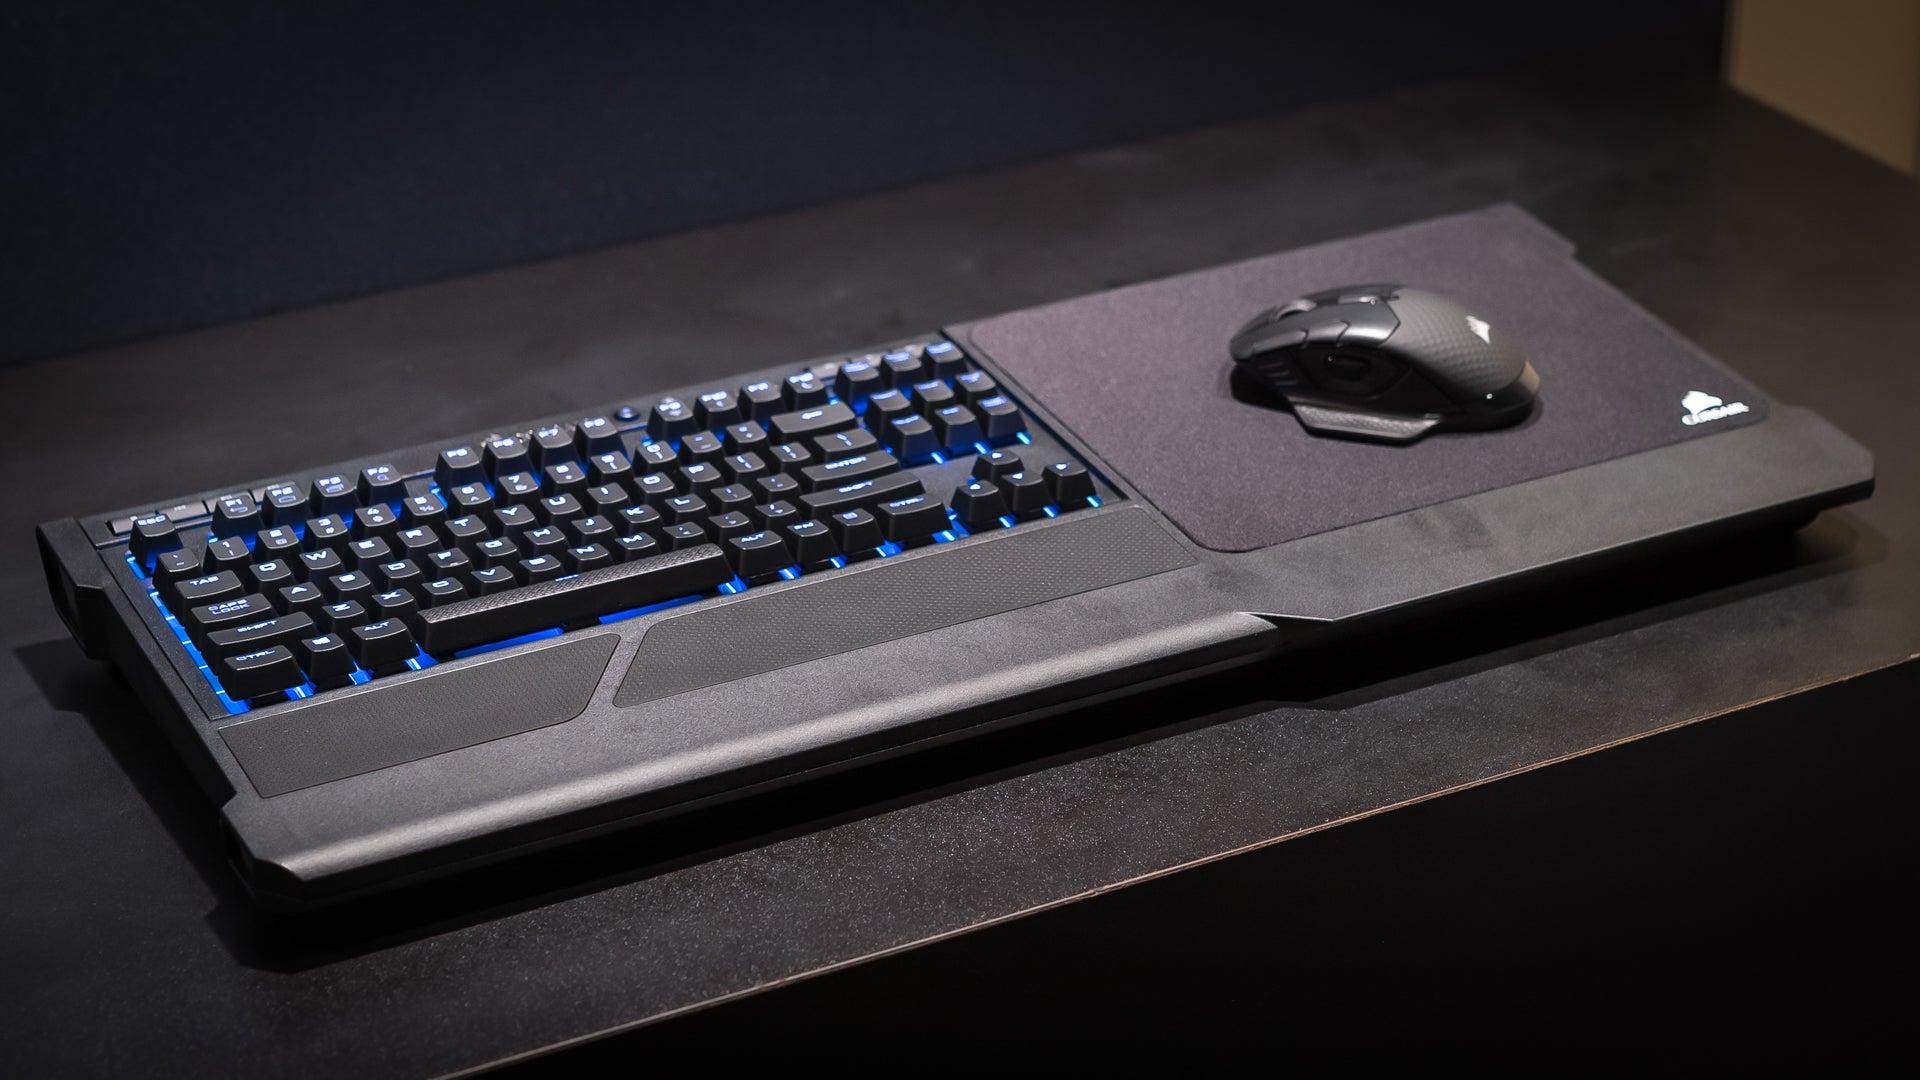 Corsair K63 Wireless Keyboard and Lapboard